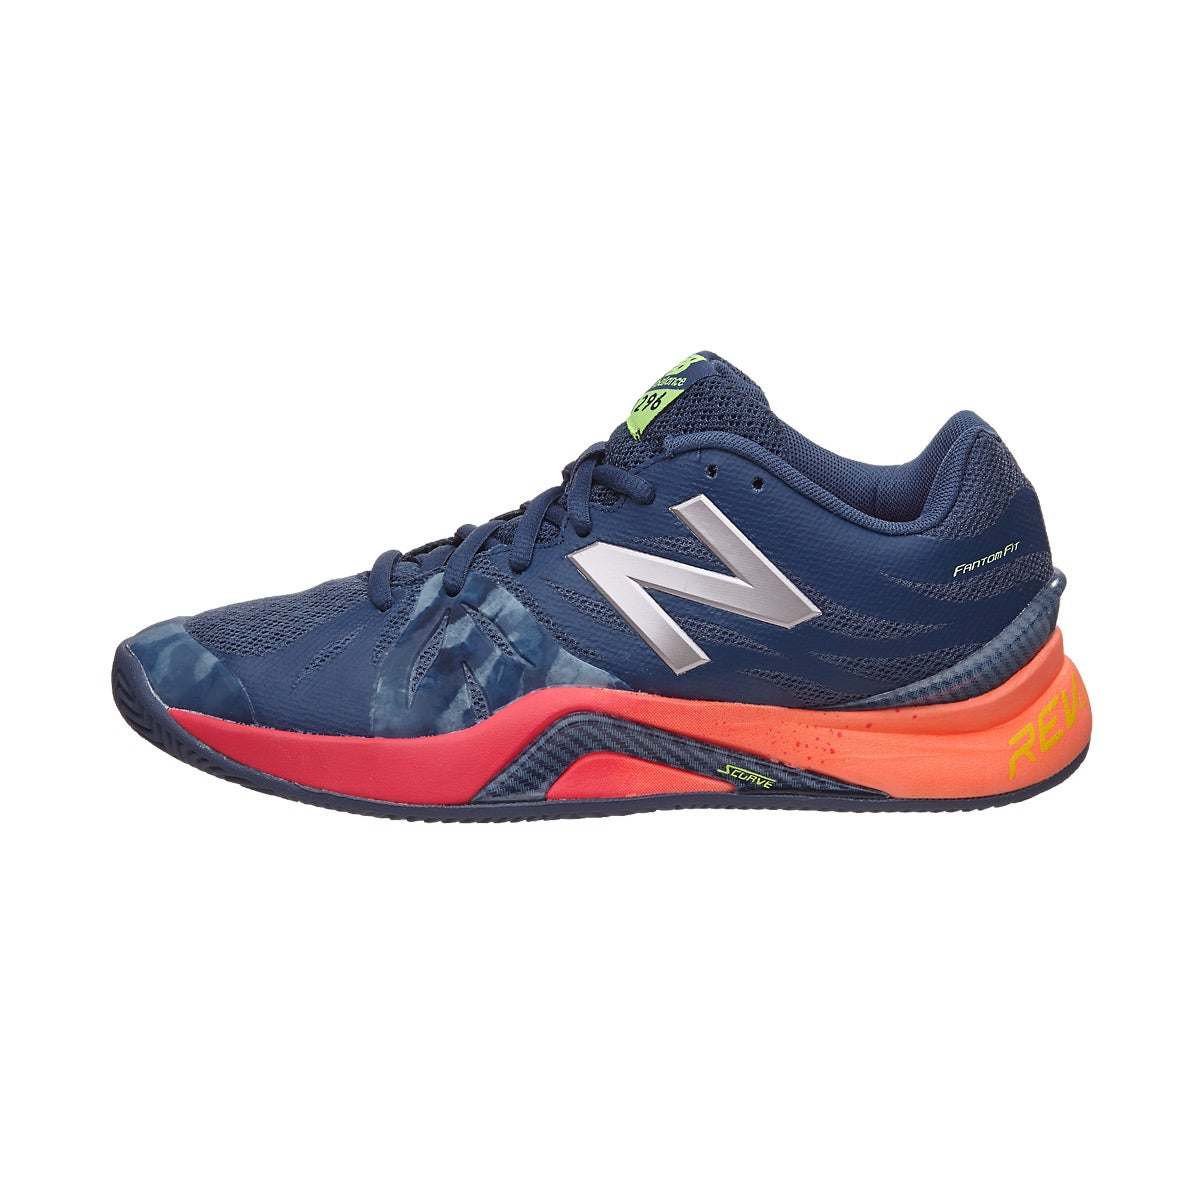 New Balance WC 1296v2 B Indigo/Pink Women's Shoe 360° View